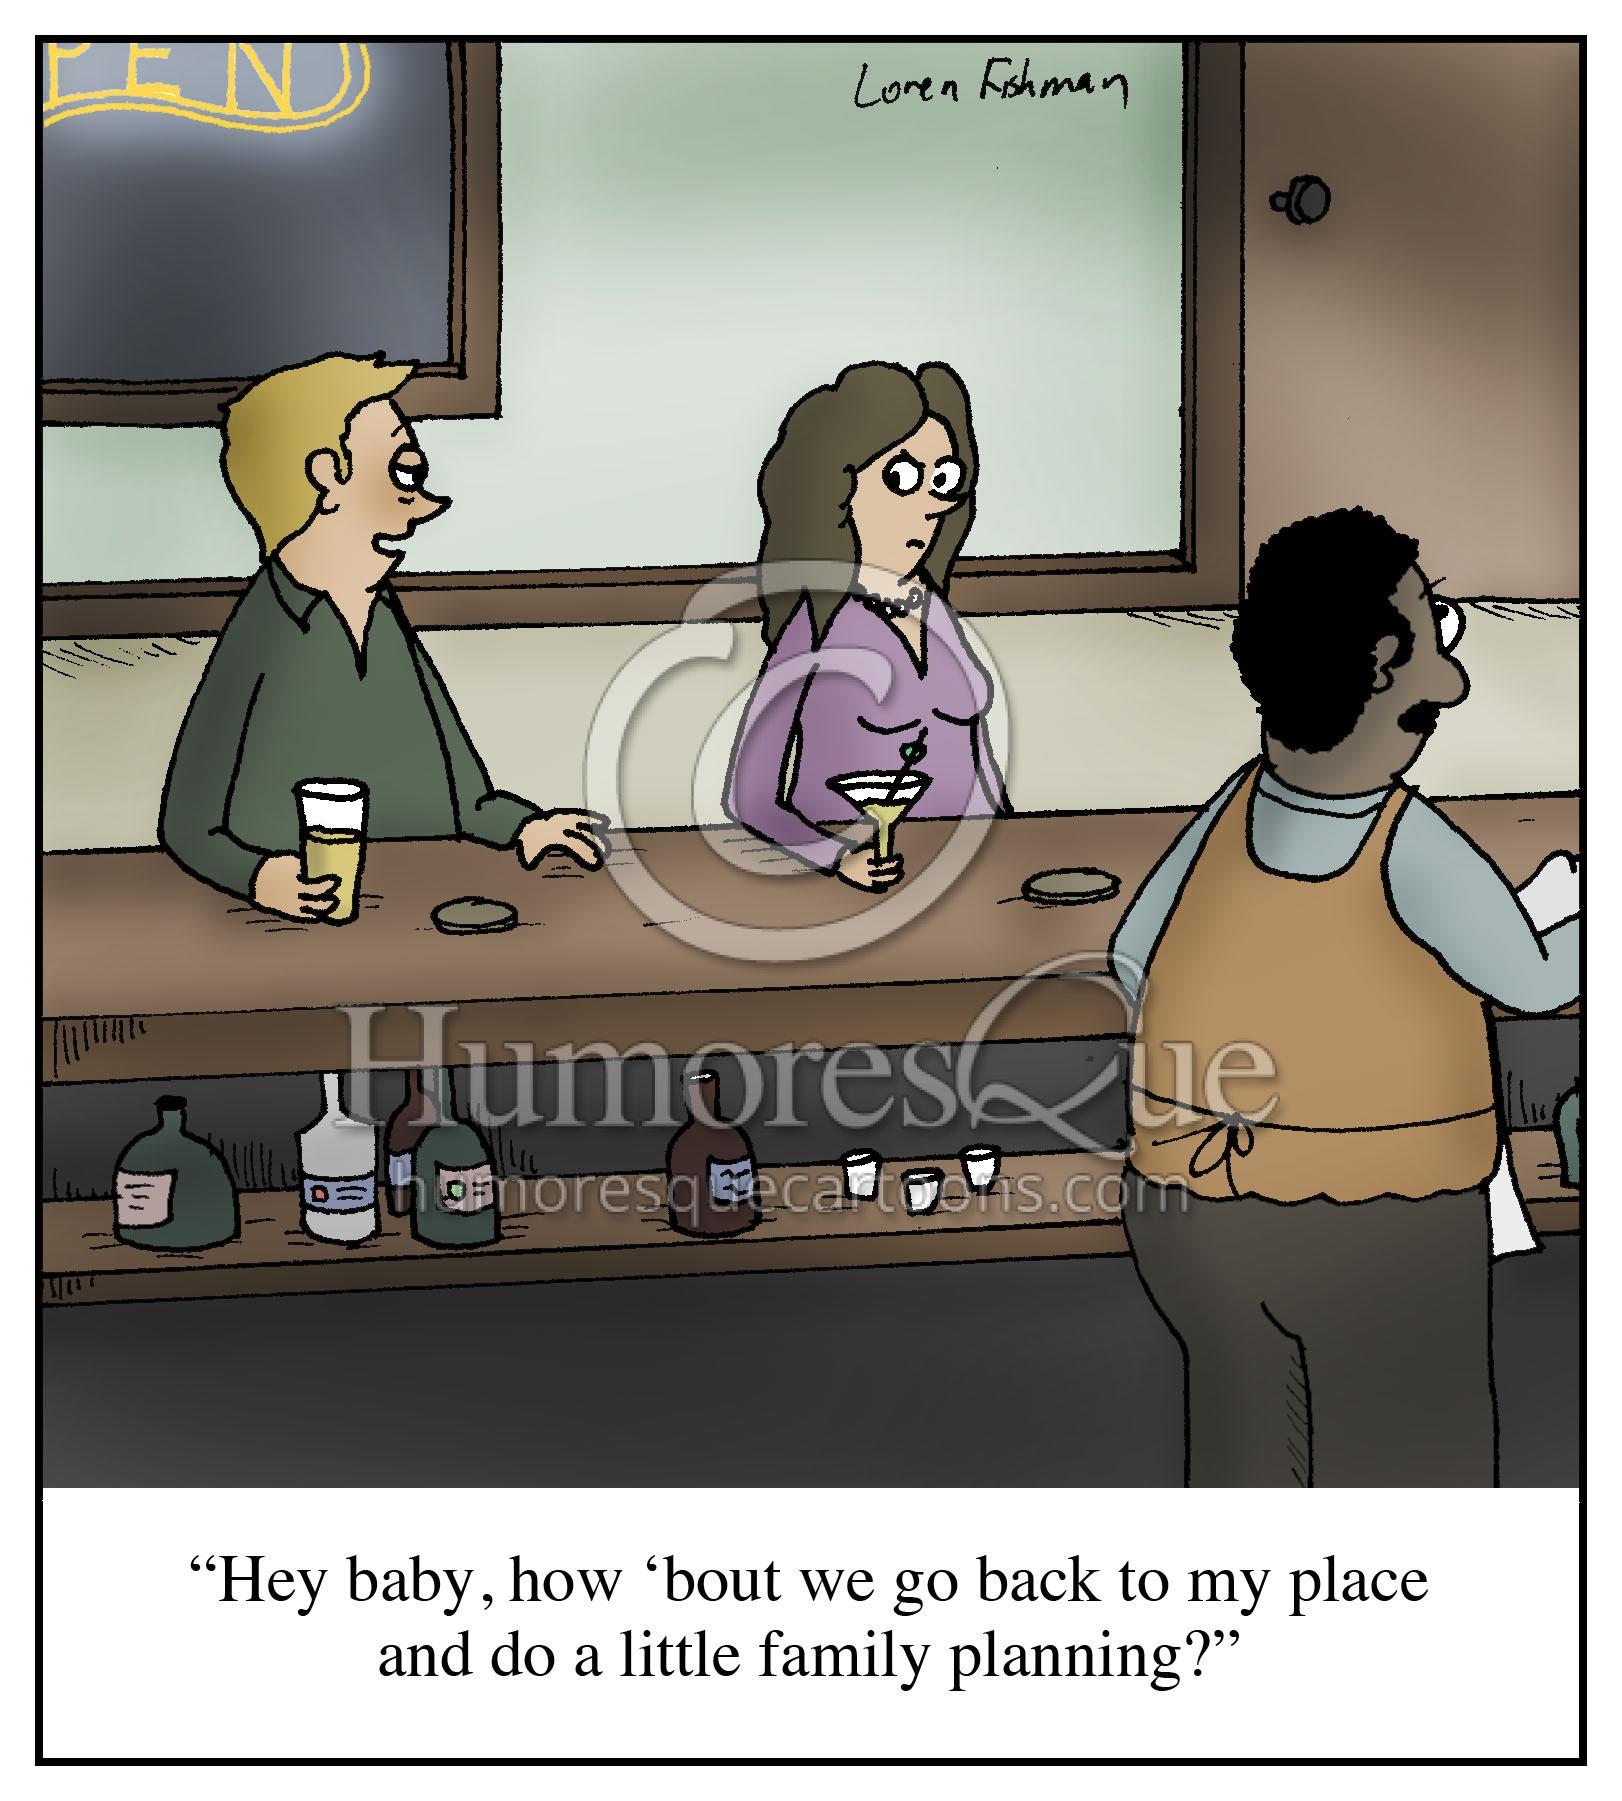 family planning euphemism dating cartoon